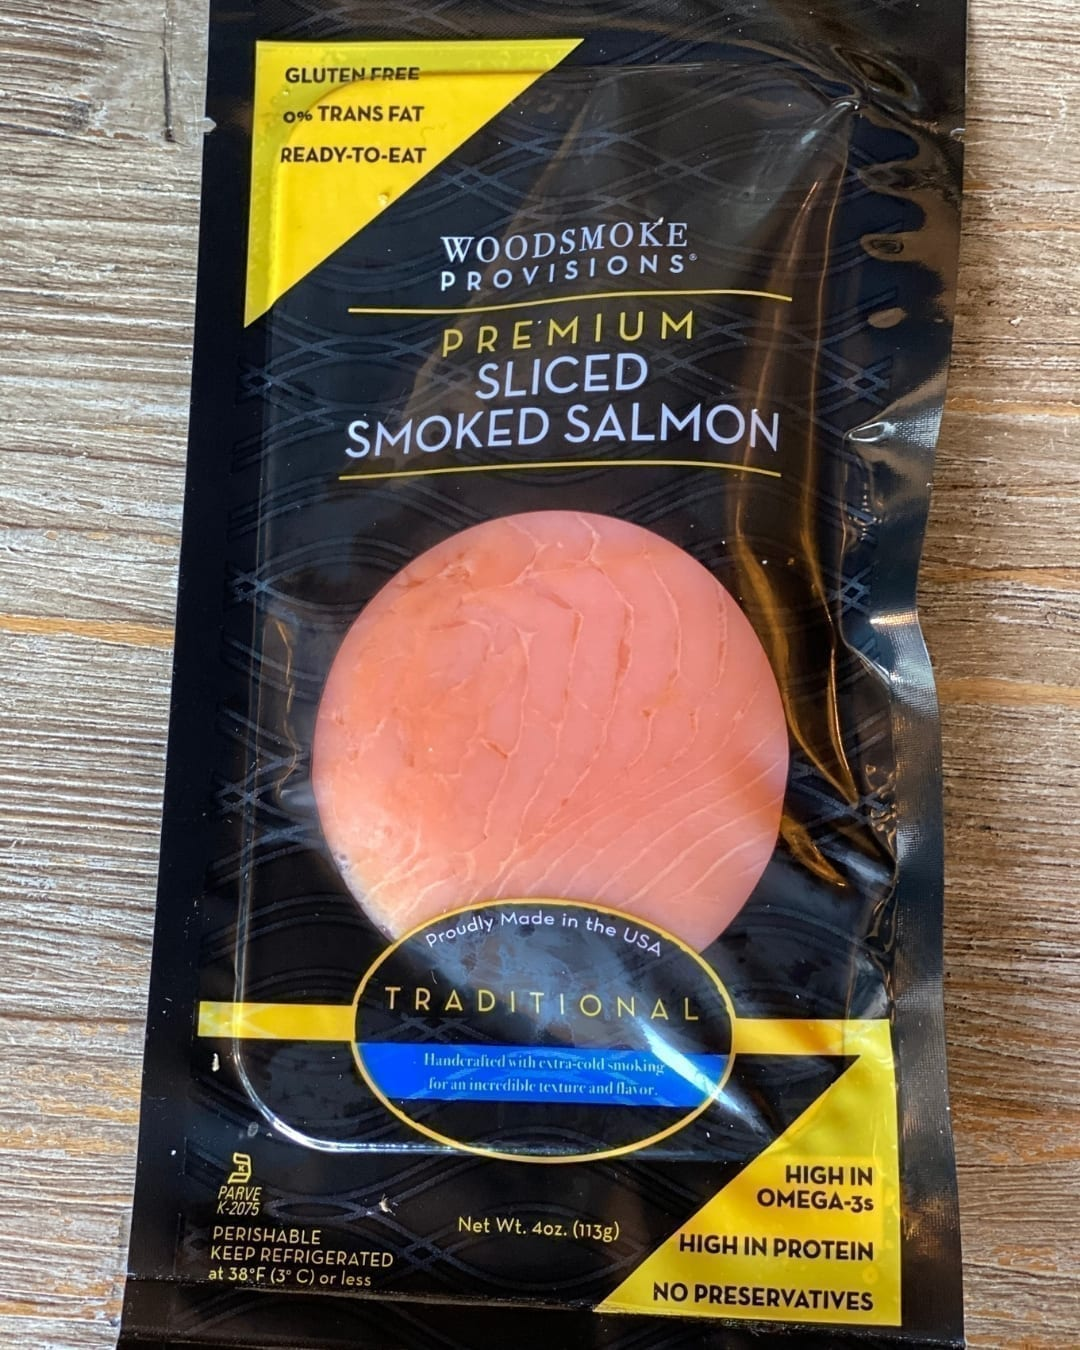 Woodsmoke Provisions Sliced Smoked Salmon